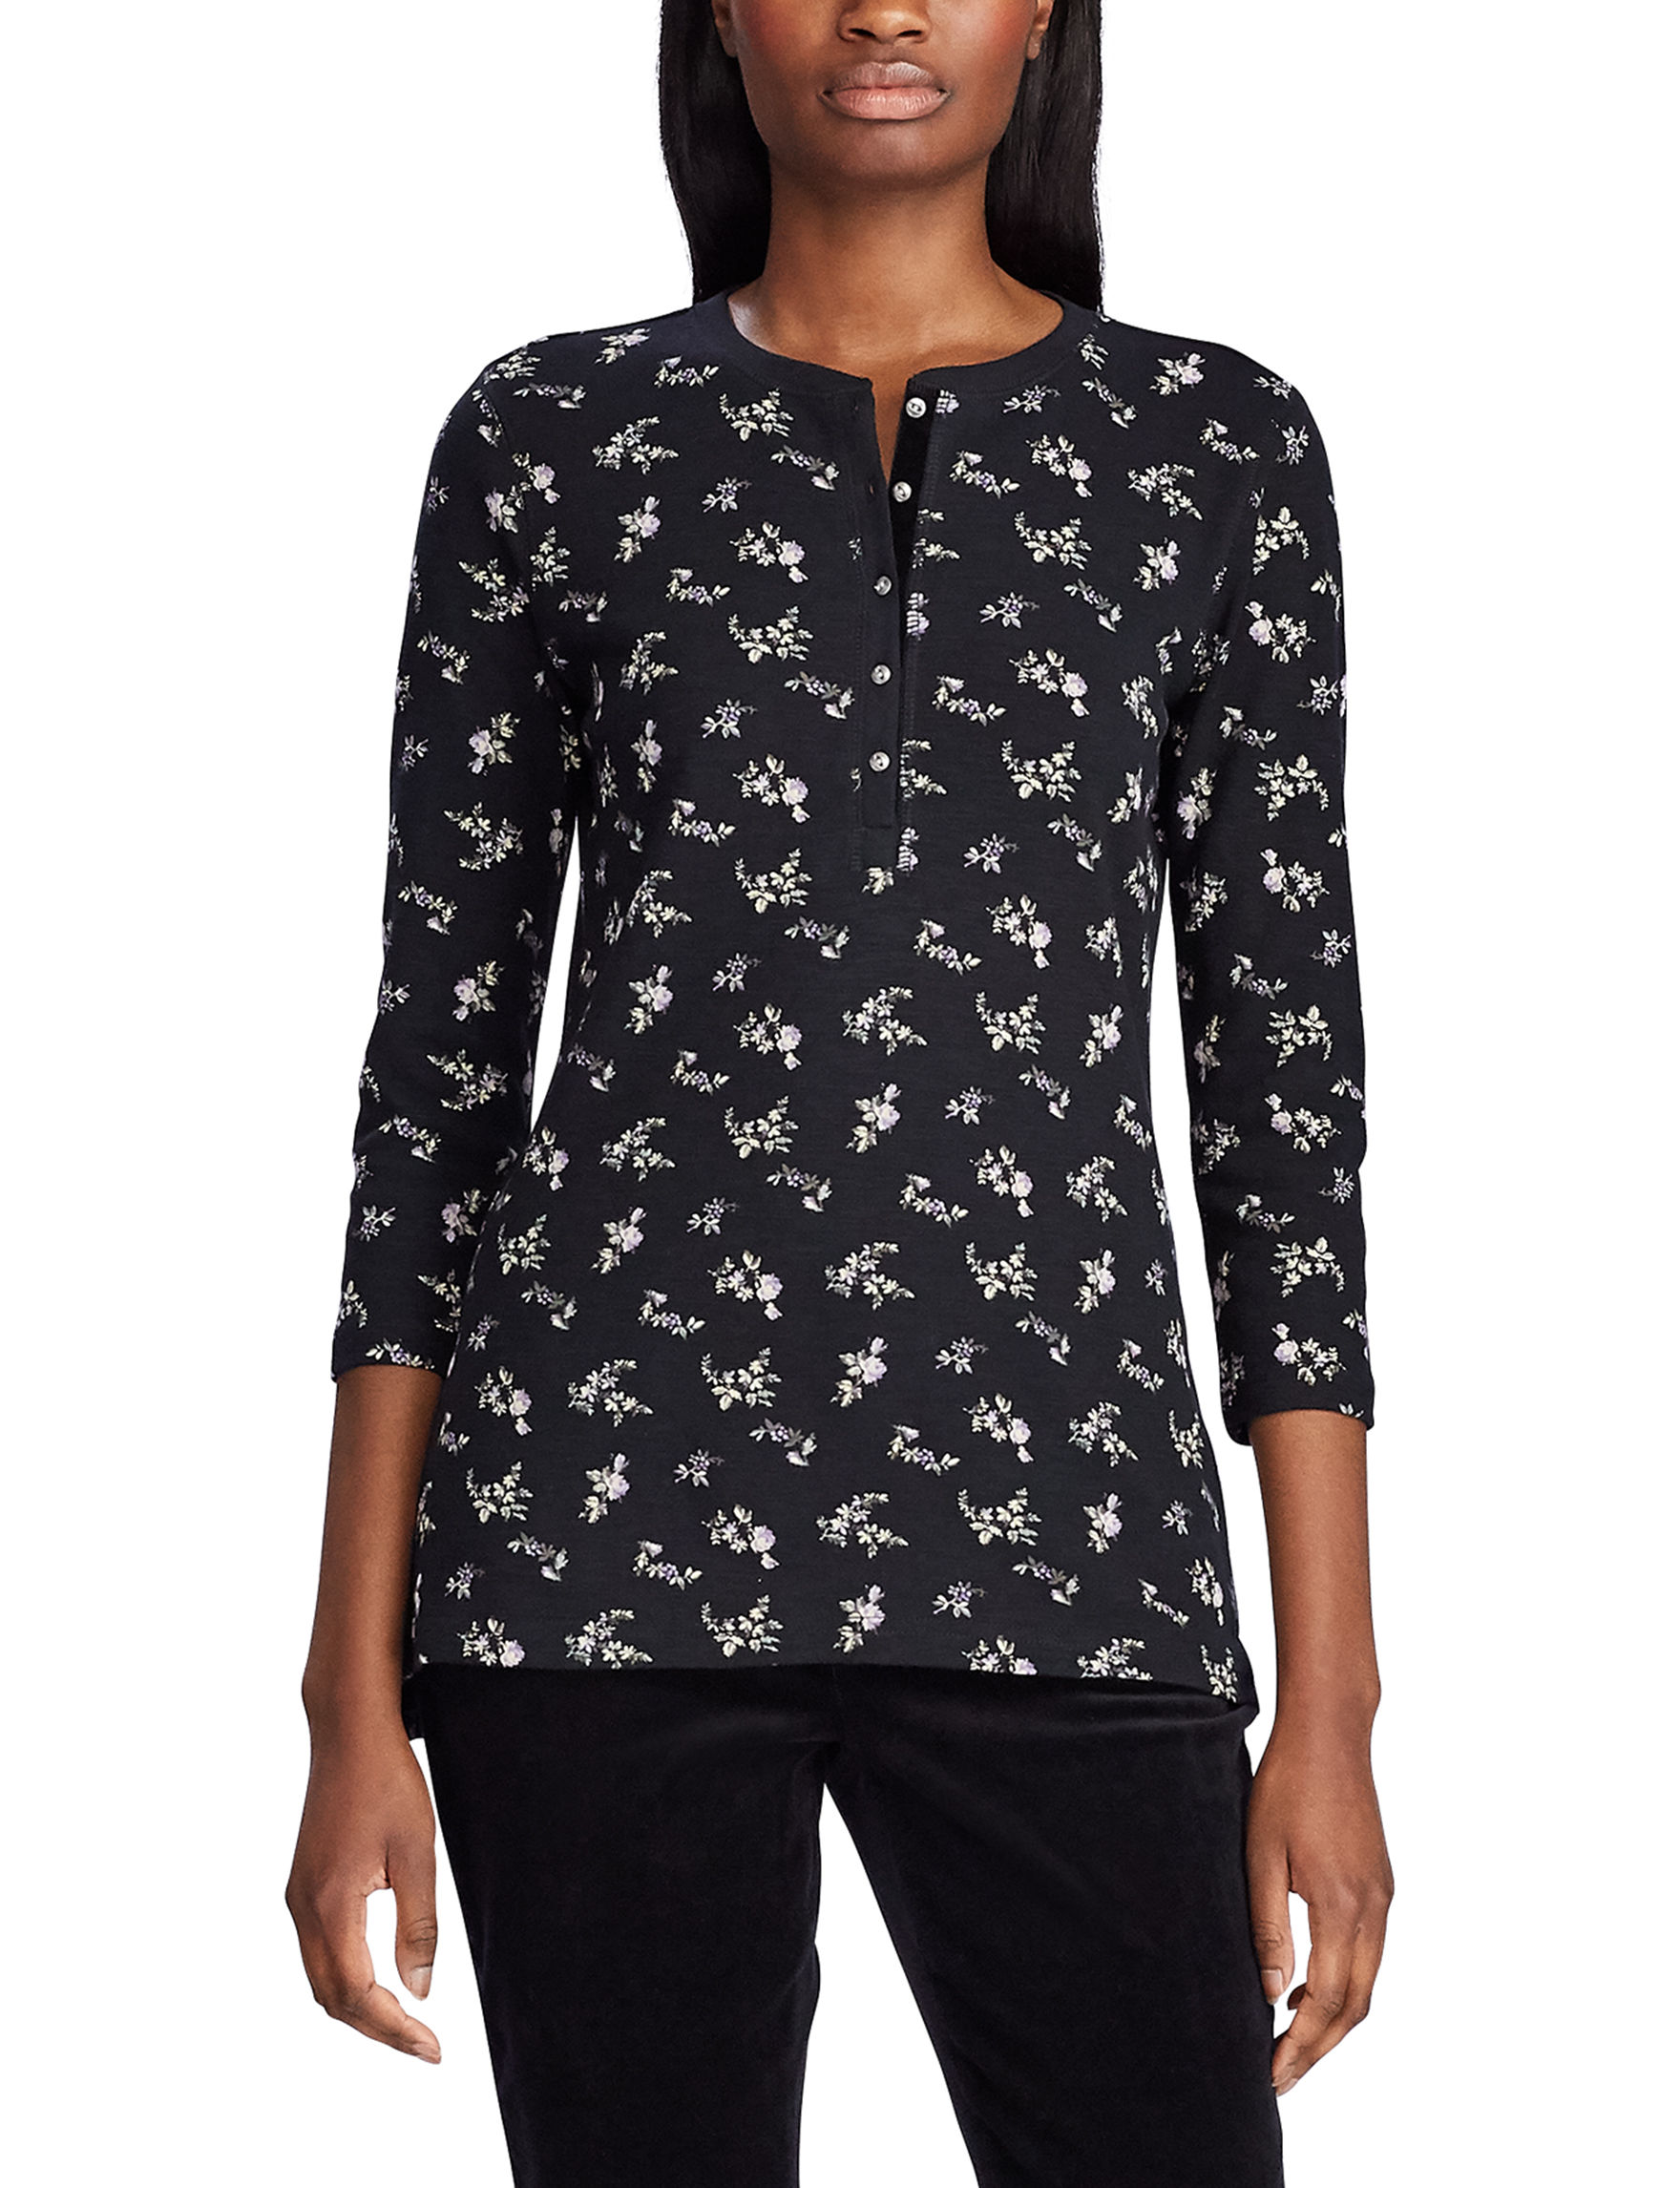 Chaps Lilac / Black Shirts & Blouses